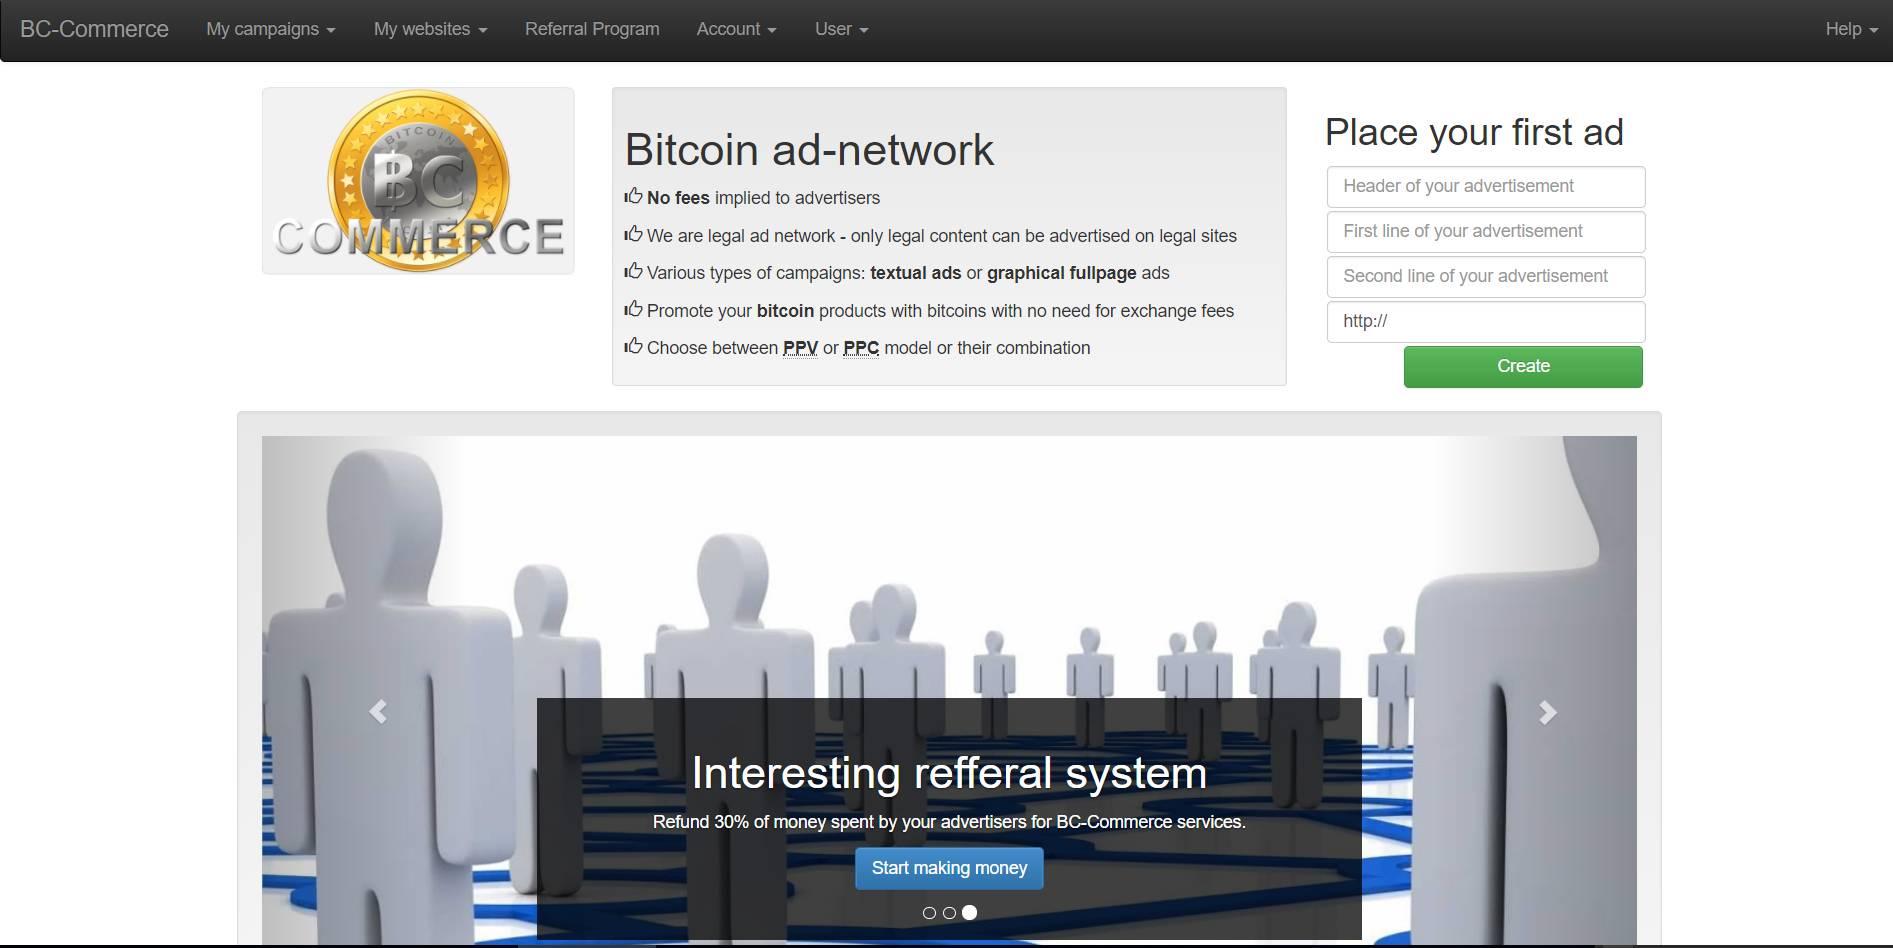 BC-Commerce